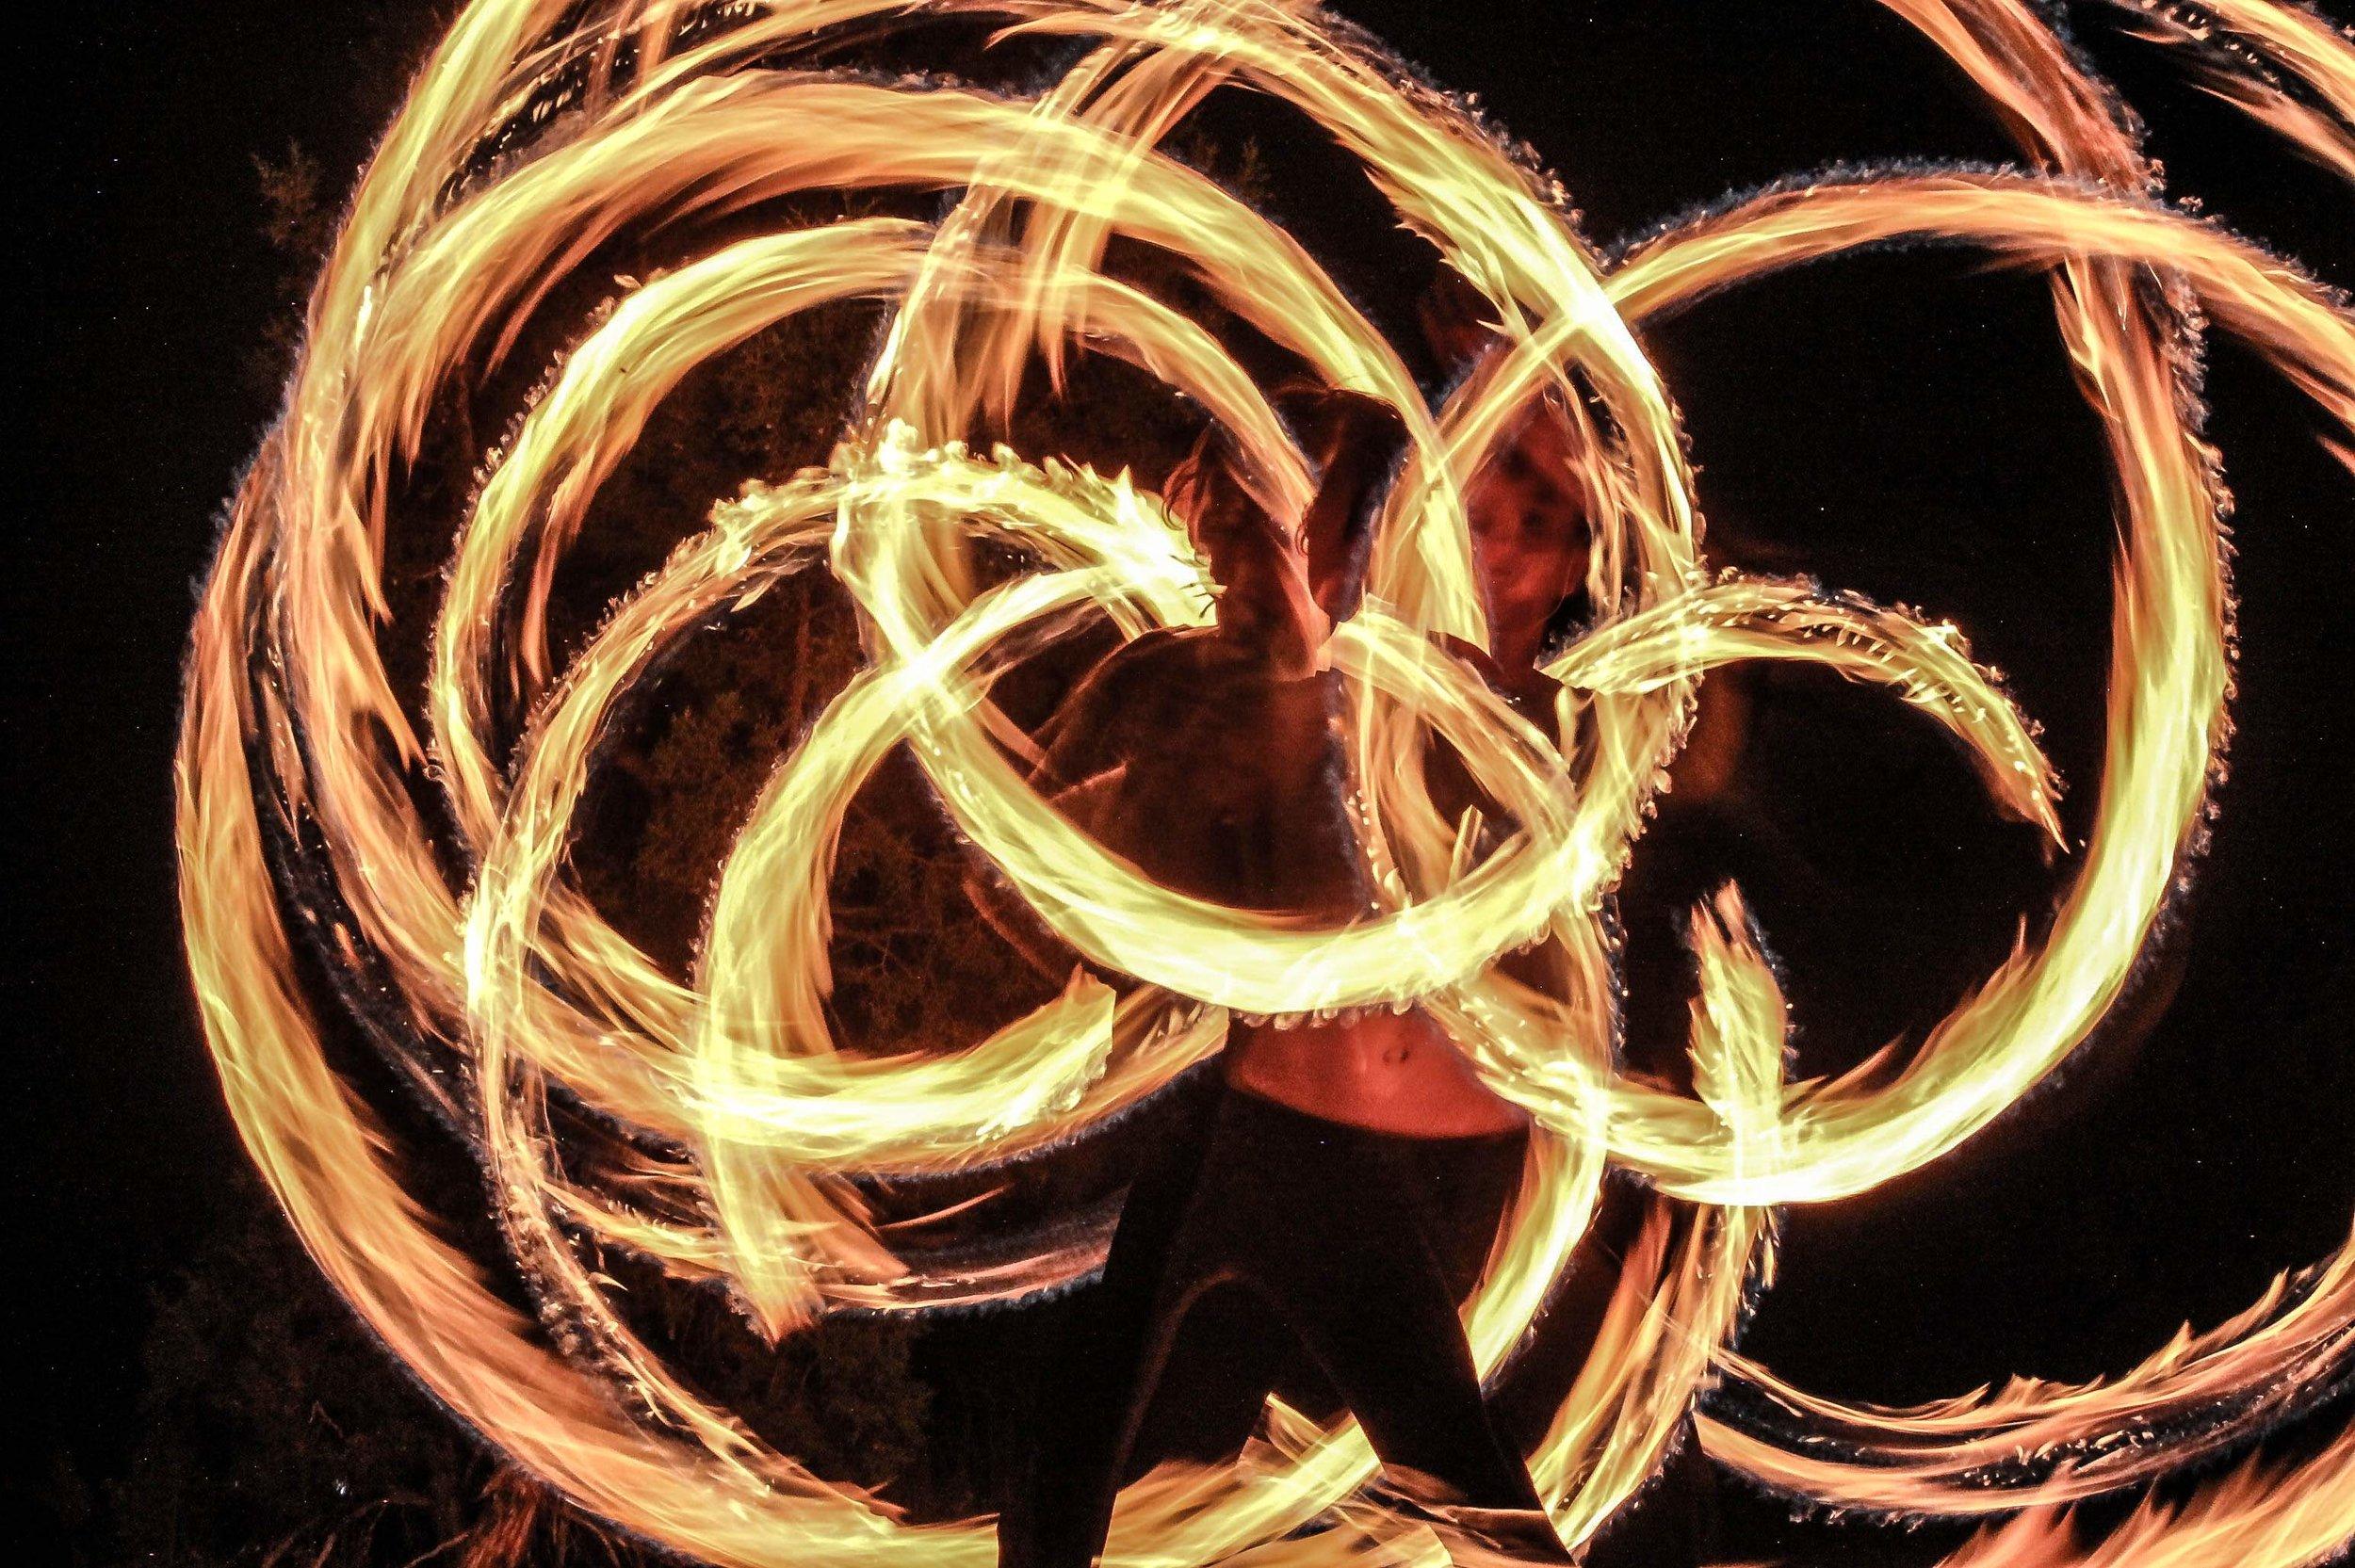 fire spinning colorado